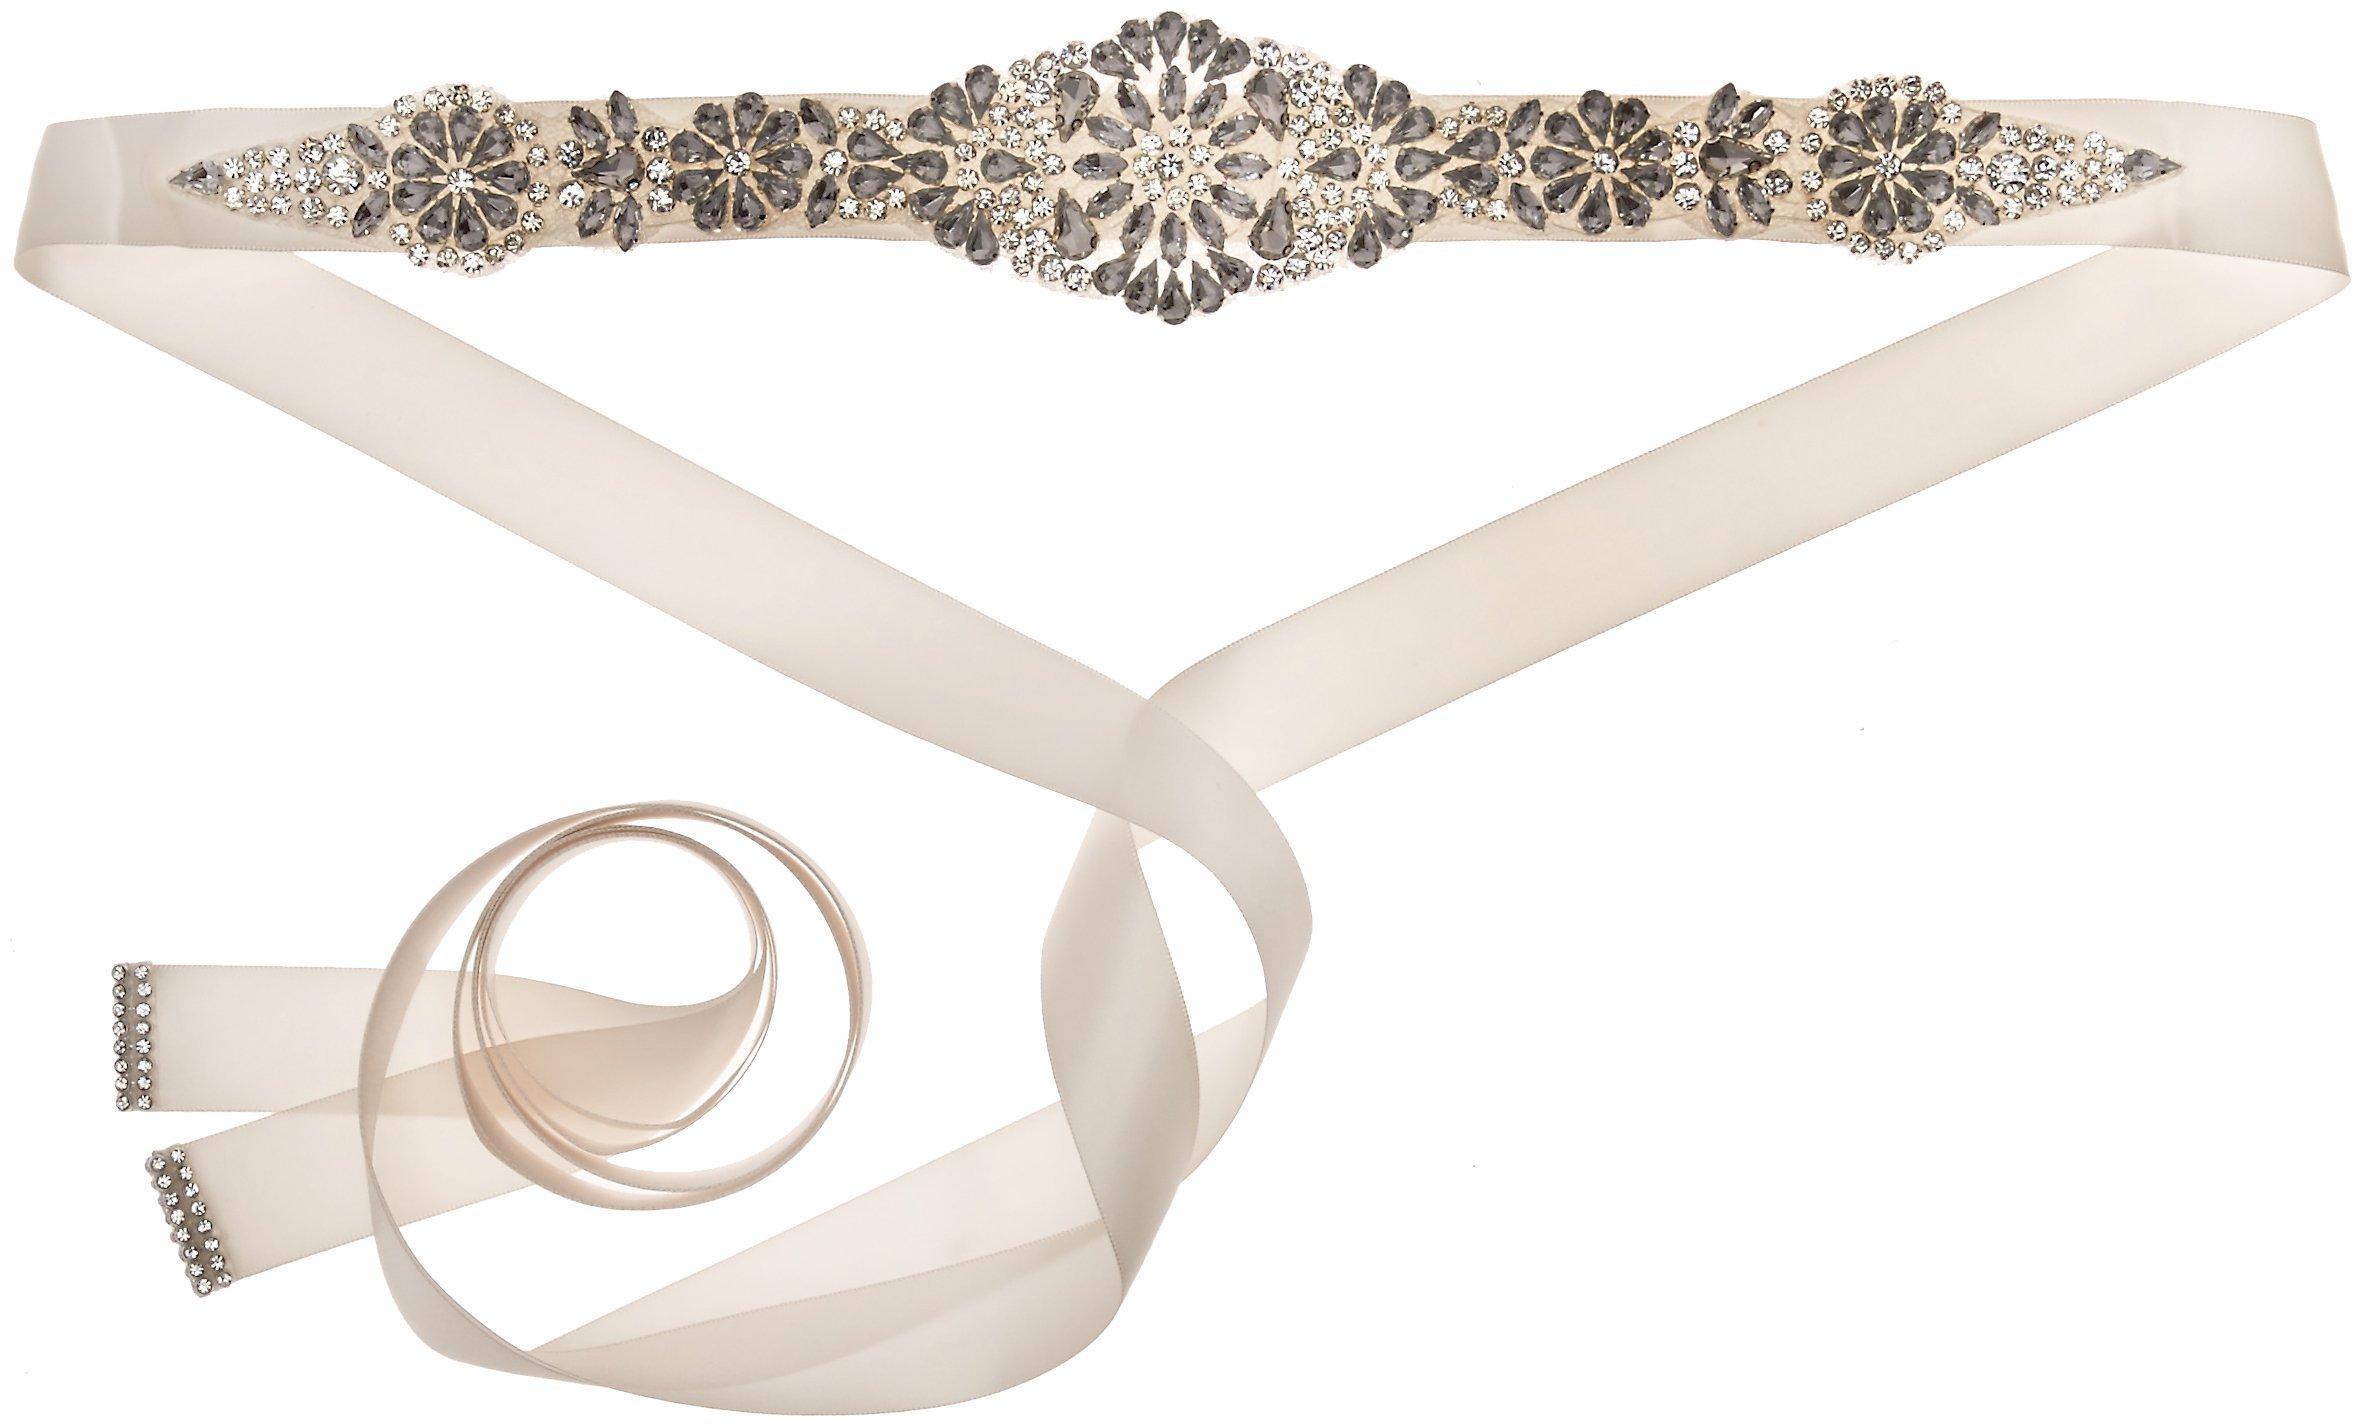 Nina Women's Aneesa Romantic Floral Embellished Satin Bridal Belt, Ivory, One Size